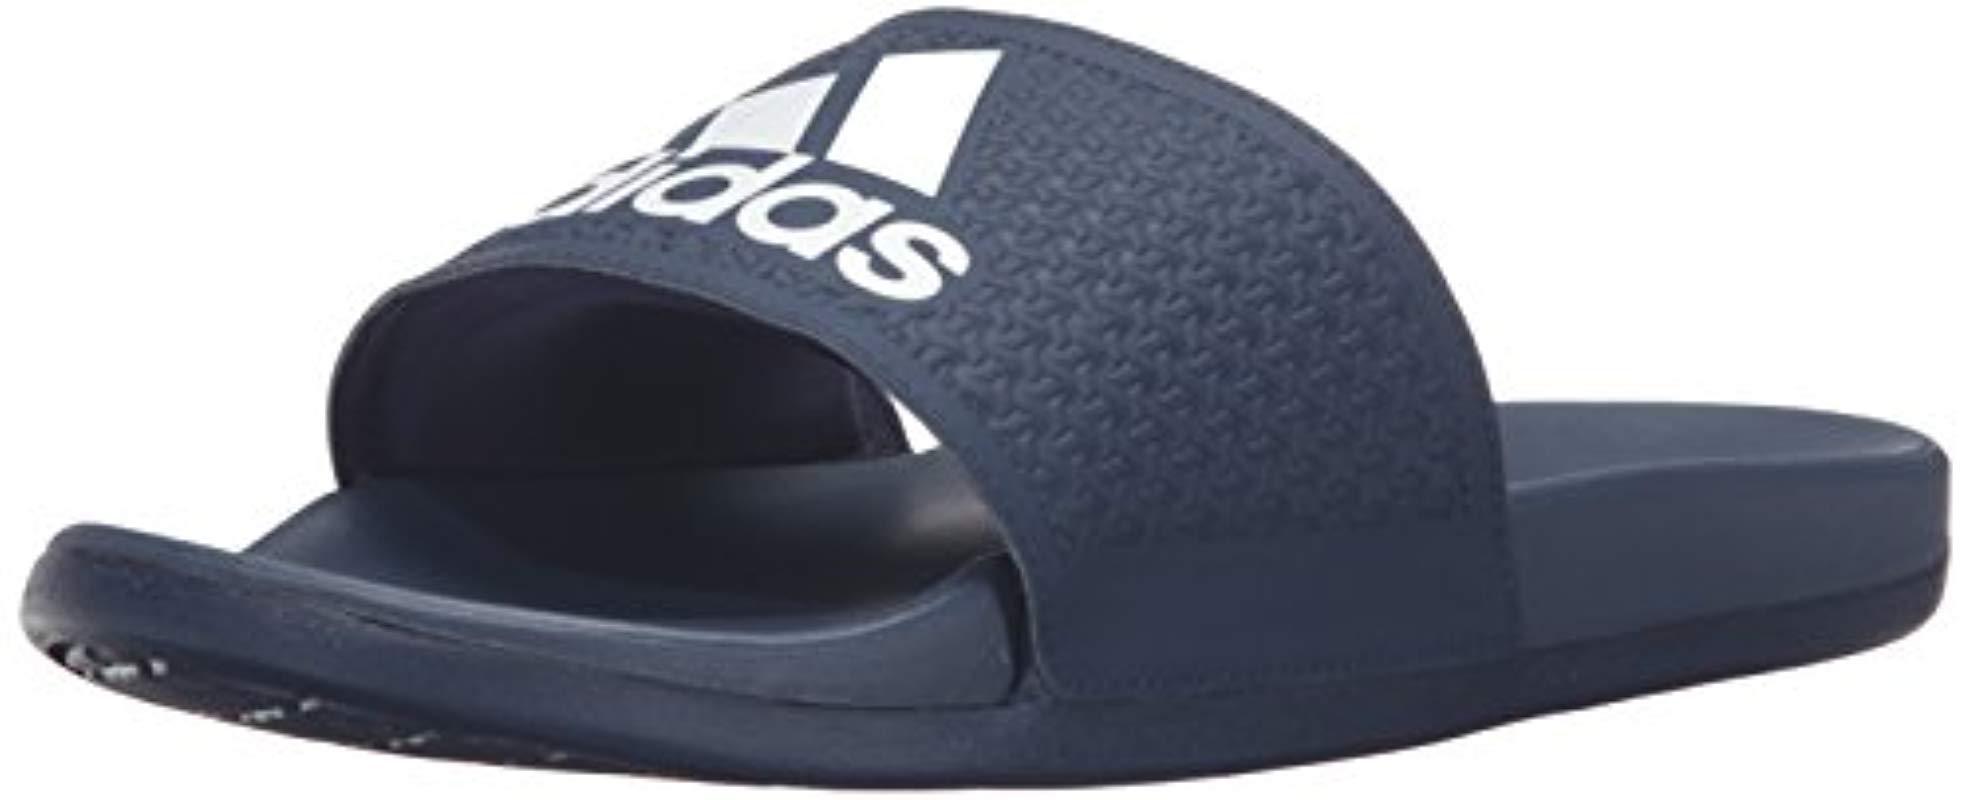 buy popular 6ce22 b99c2 Lyst - adidas Adilette Cf Ultra C Cross-trainer Shoe in Blue